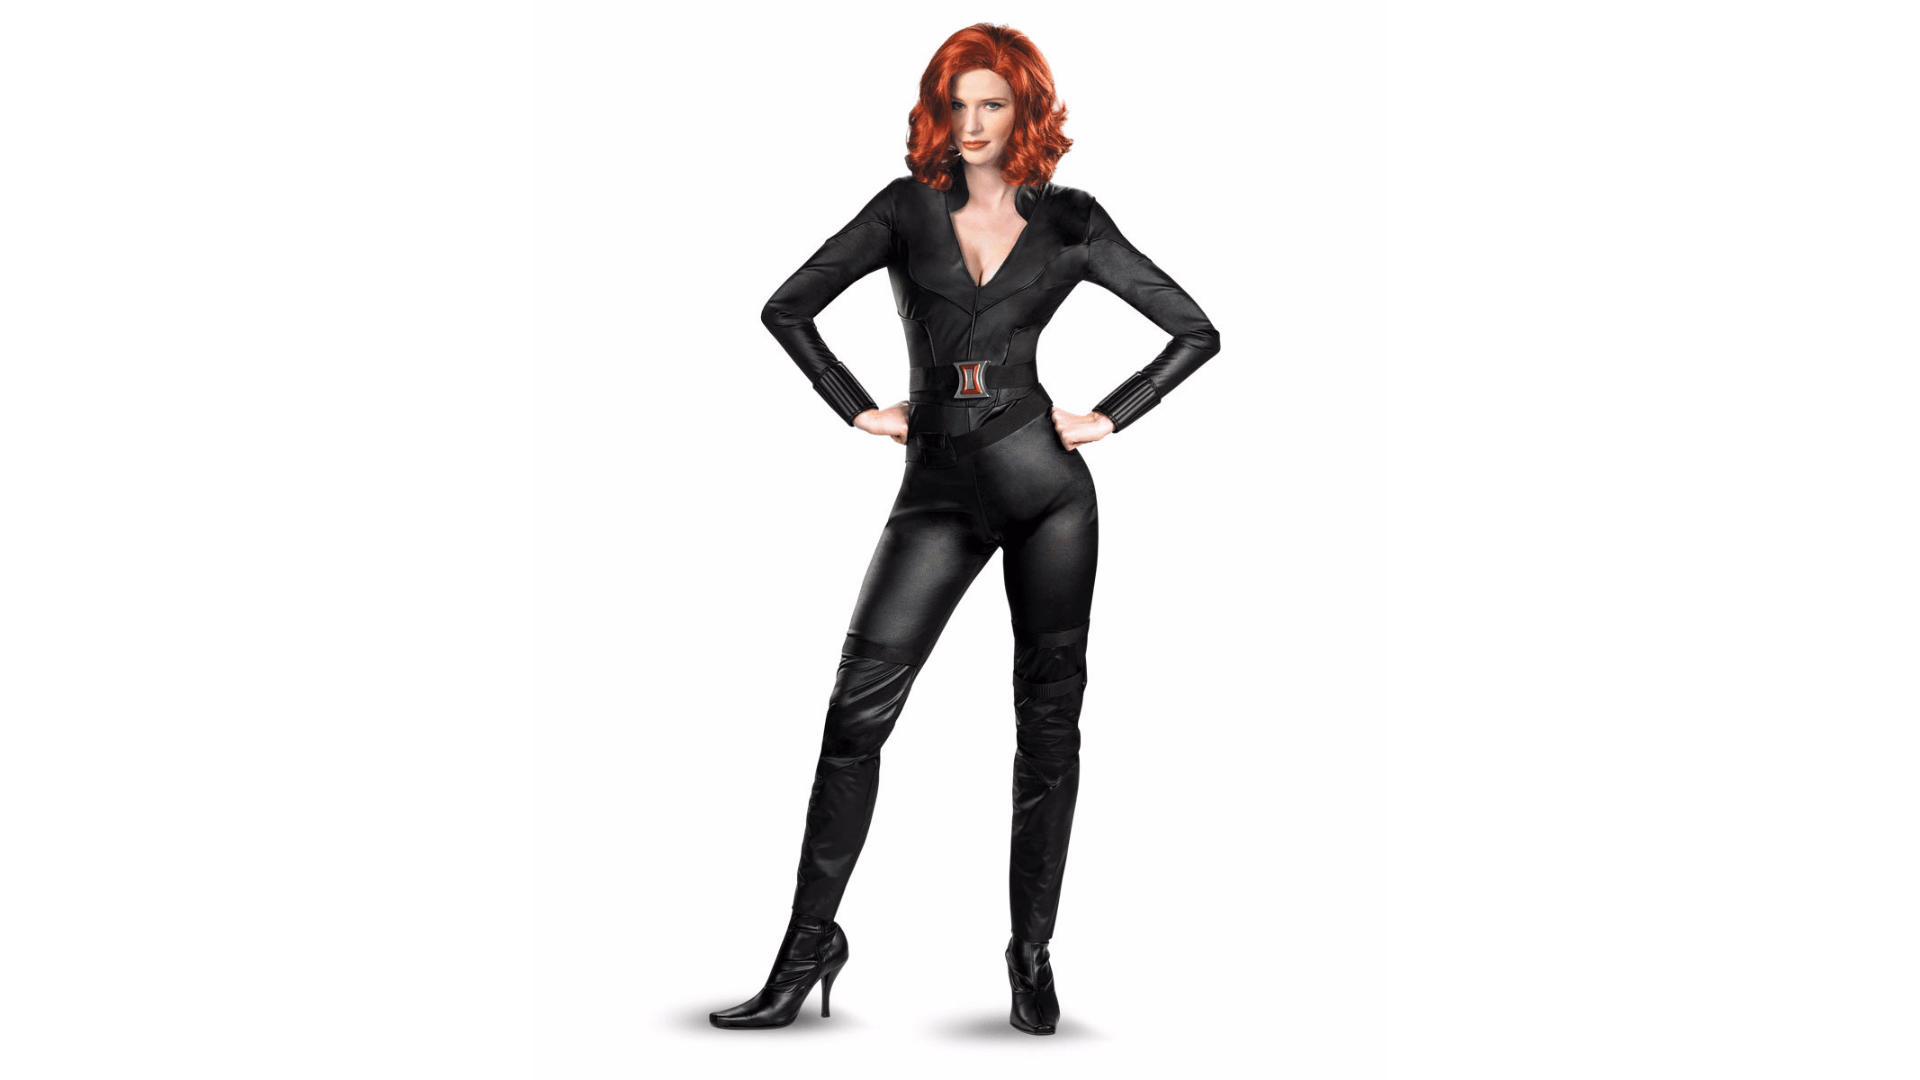 sc 1 st  Elite Daily & 6 Female Superhero Costume Ideas That Arenu0027t Just u0027Wonder Womanu0027